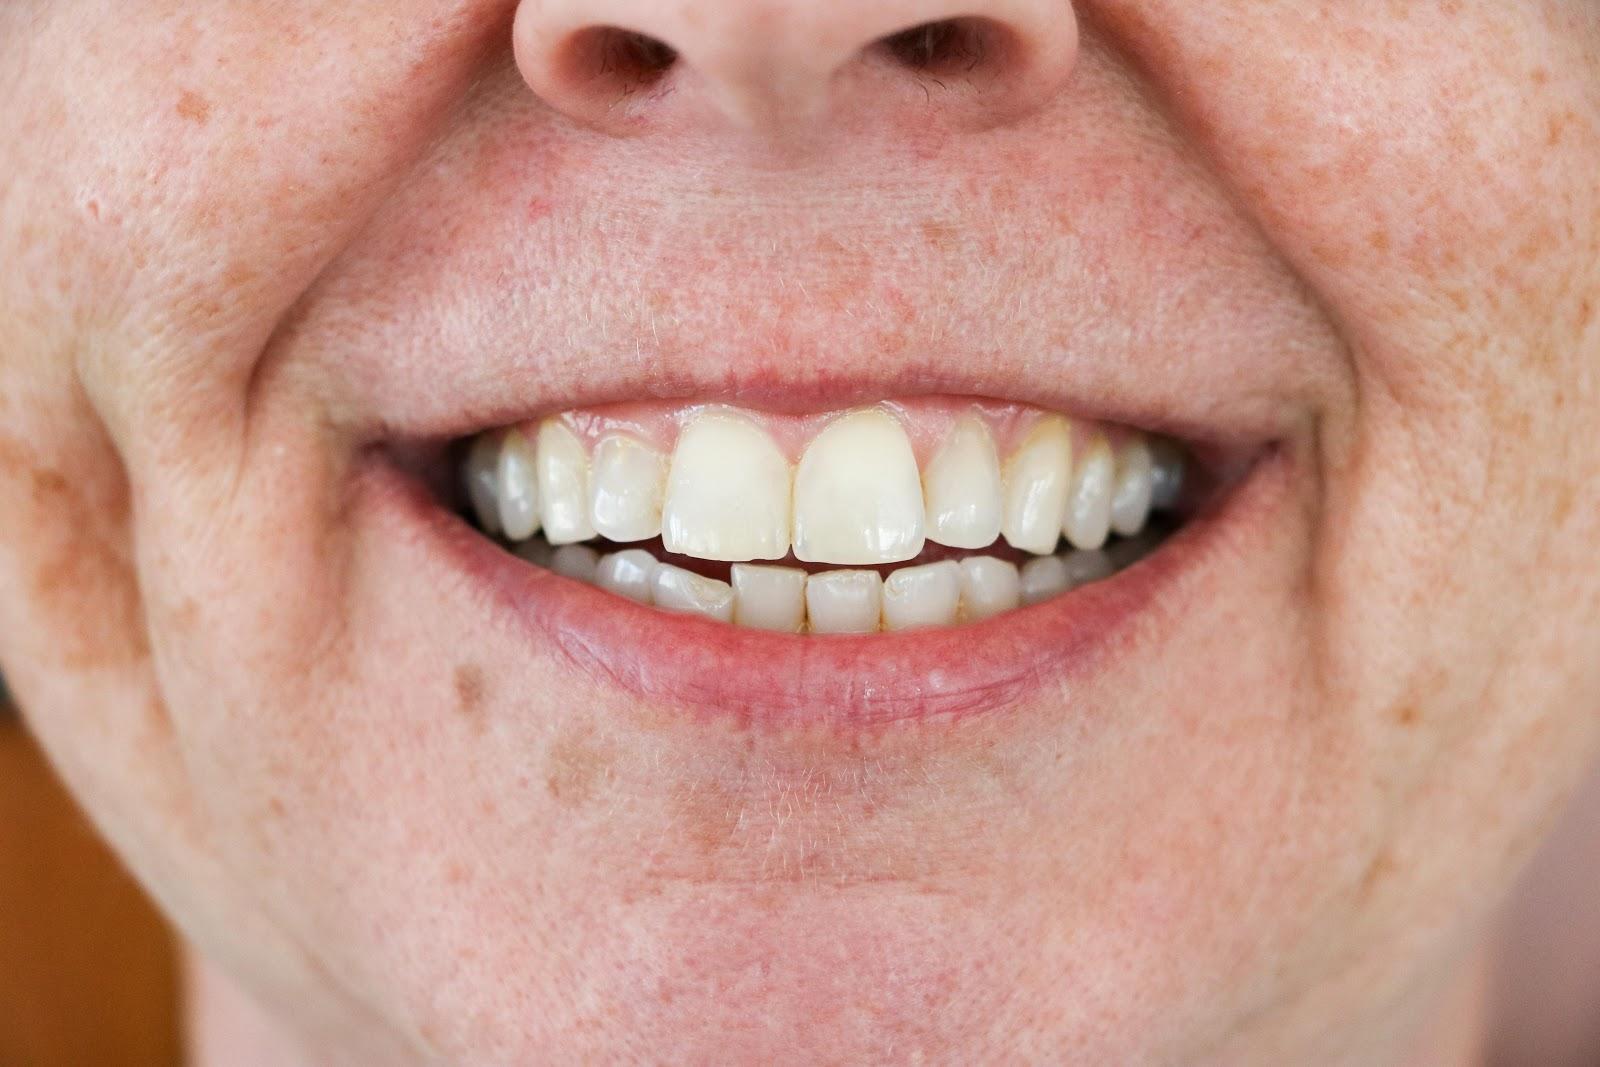 Stephanie's teeth before with teeth stains